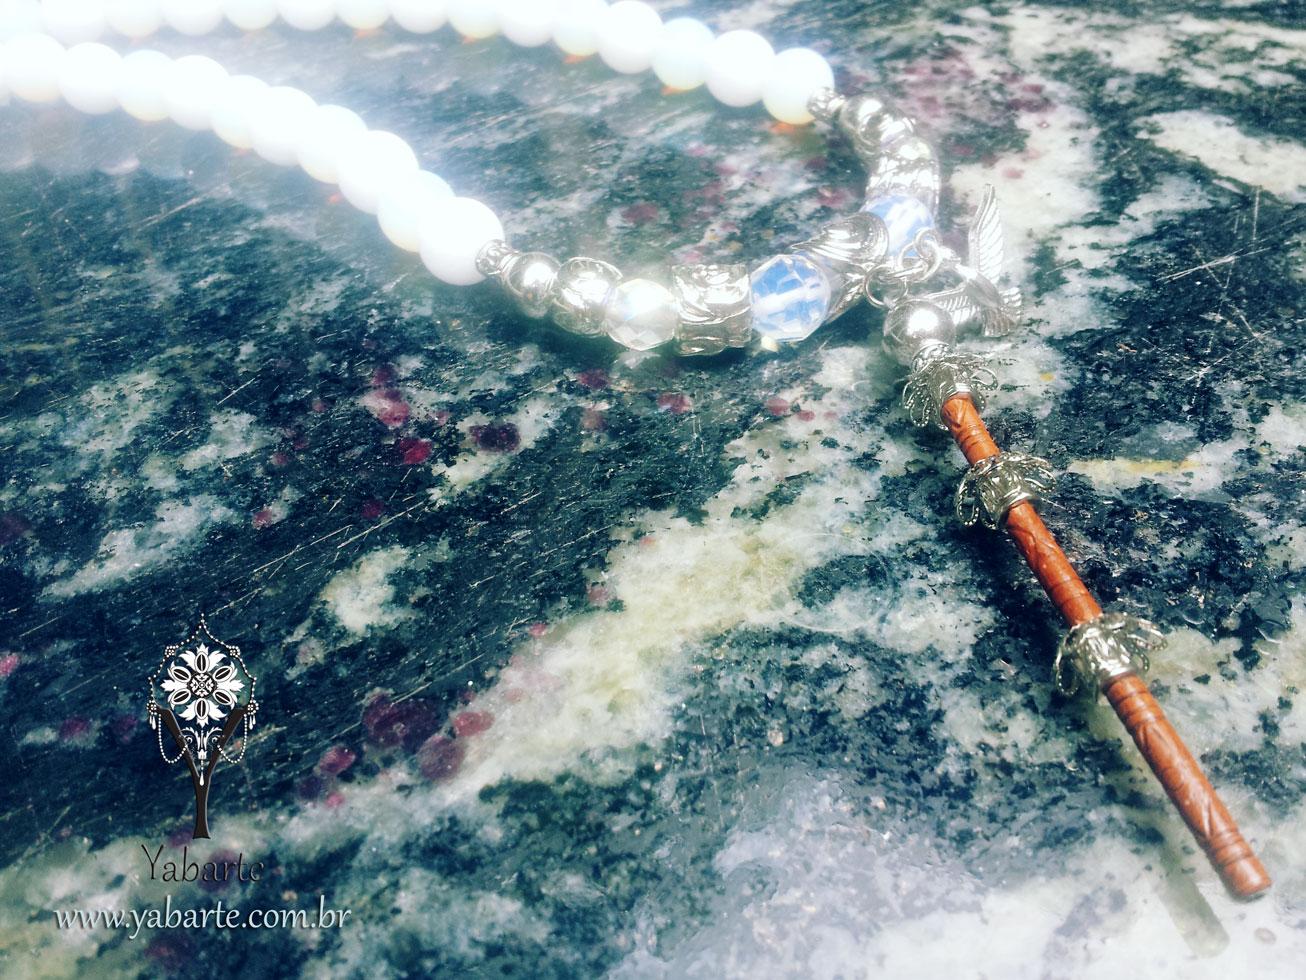 Guia de Oxalá em Pedra Natural com Mini Opaxorô